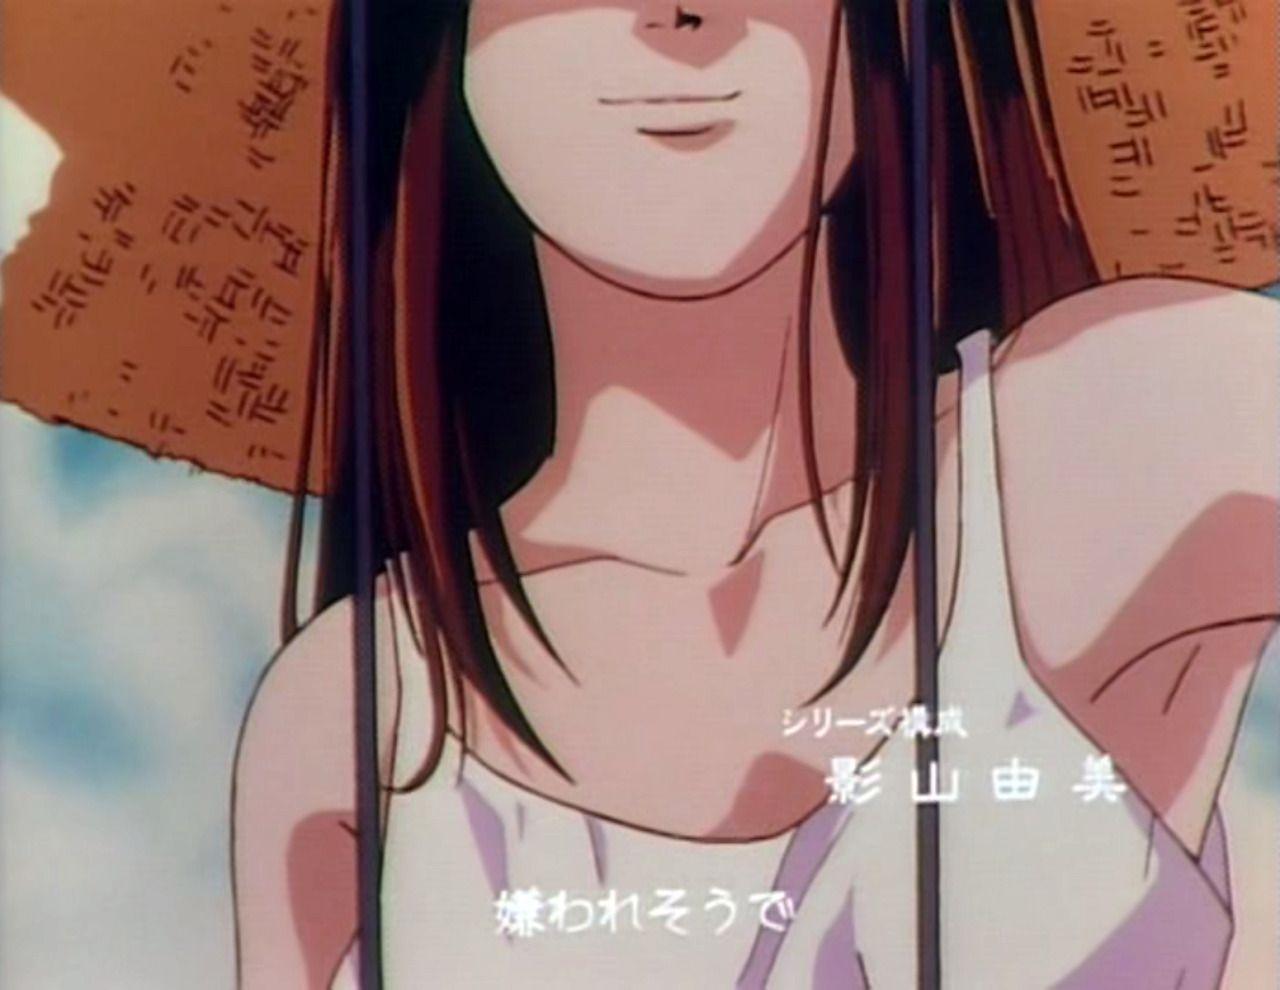 pin by レトロオタク on レトロアニメ anime shoujo art